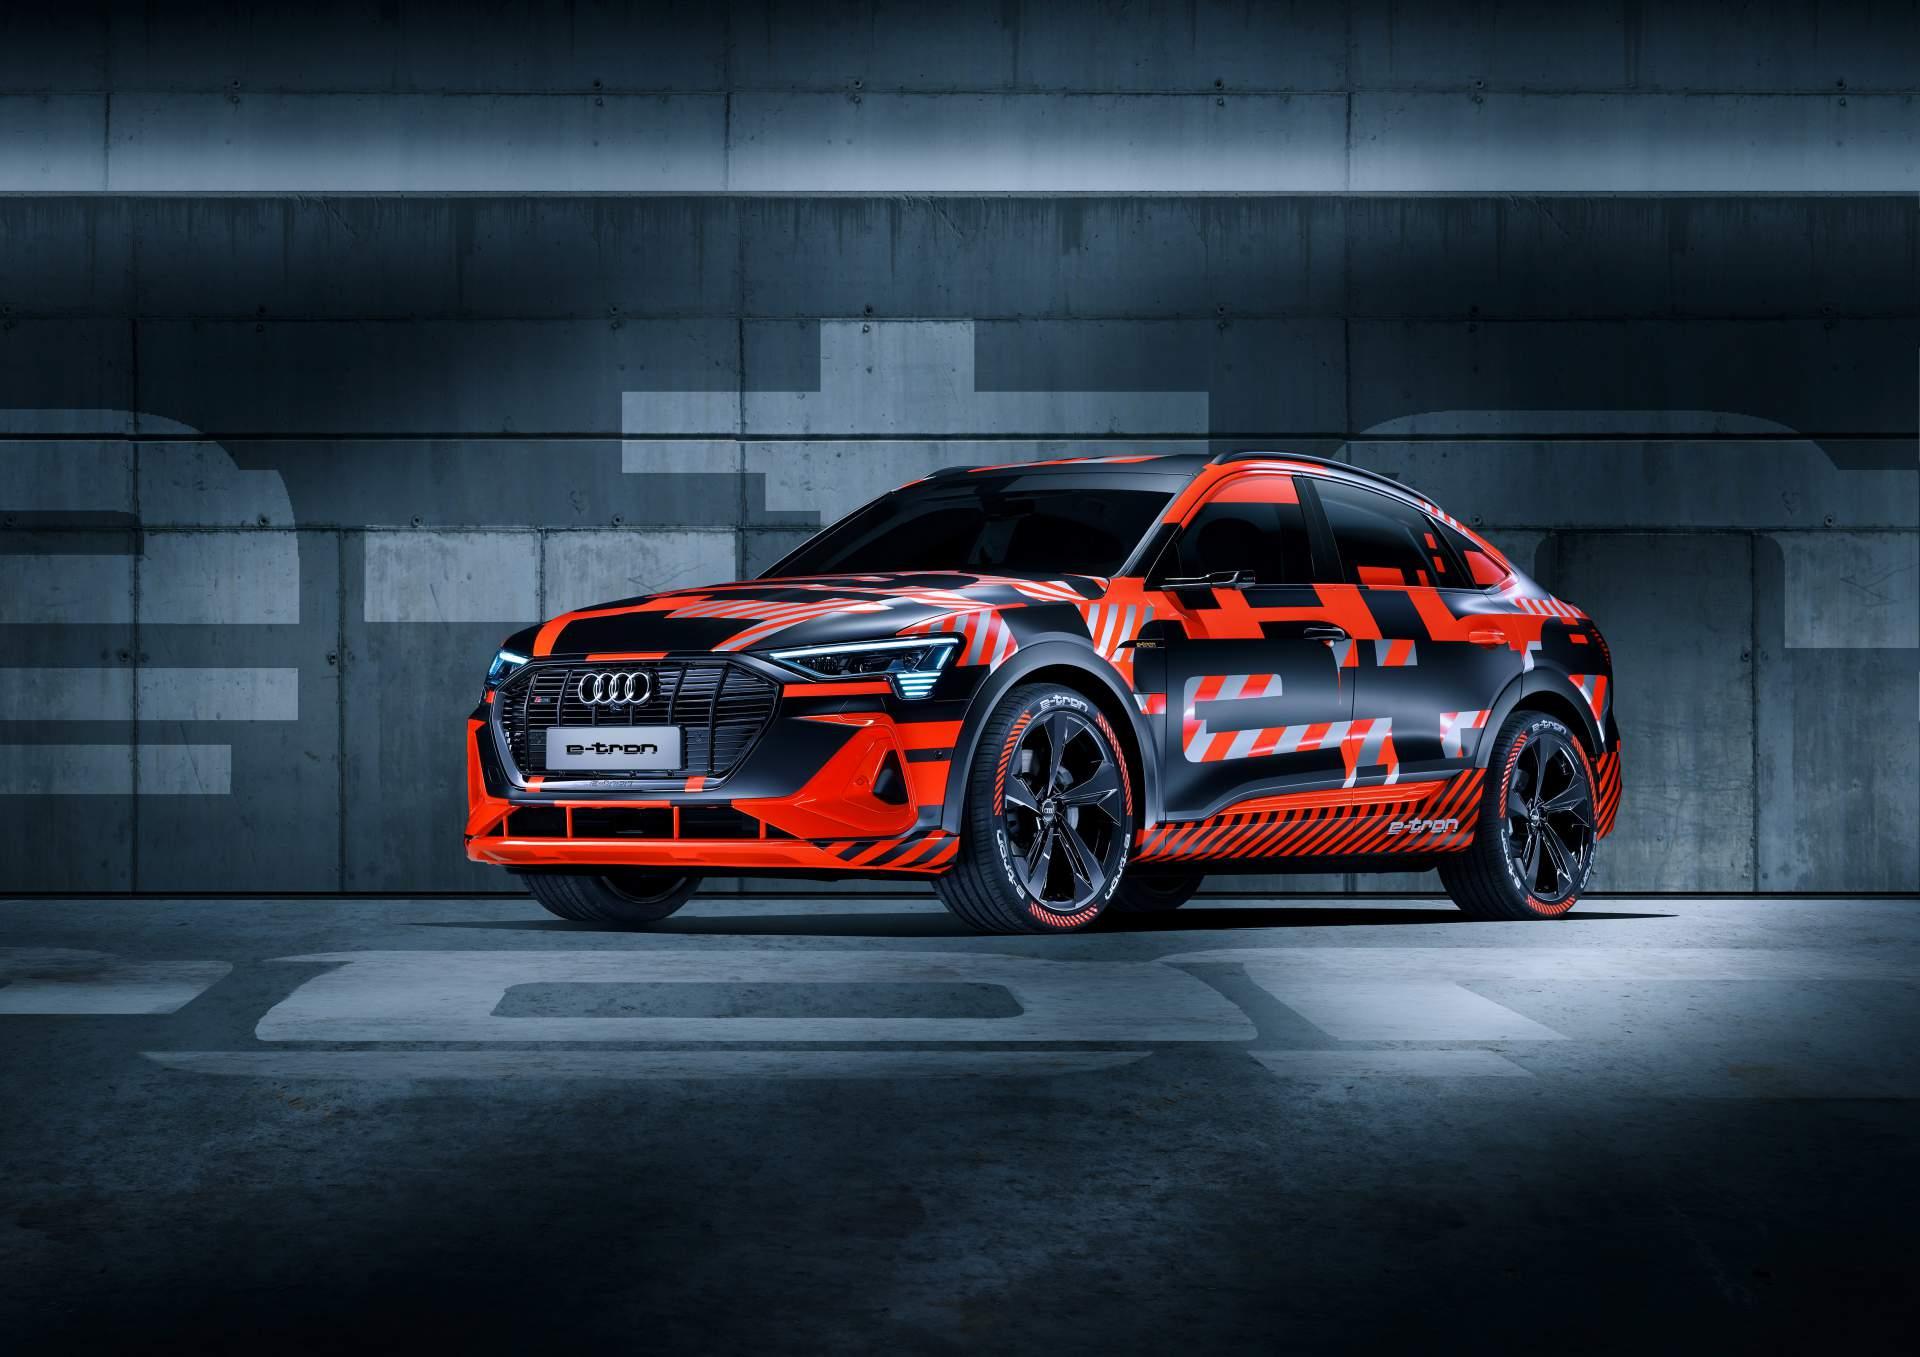 2f6e0de9-audi-e-tron-sportback-prototype-1